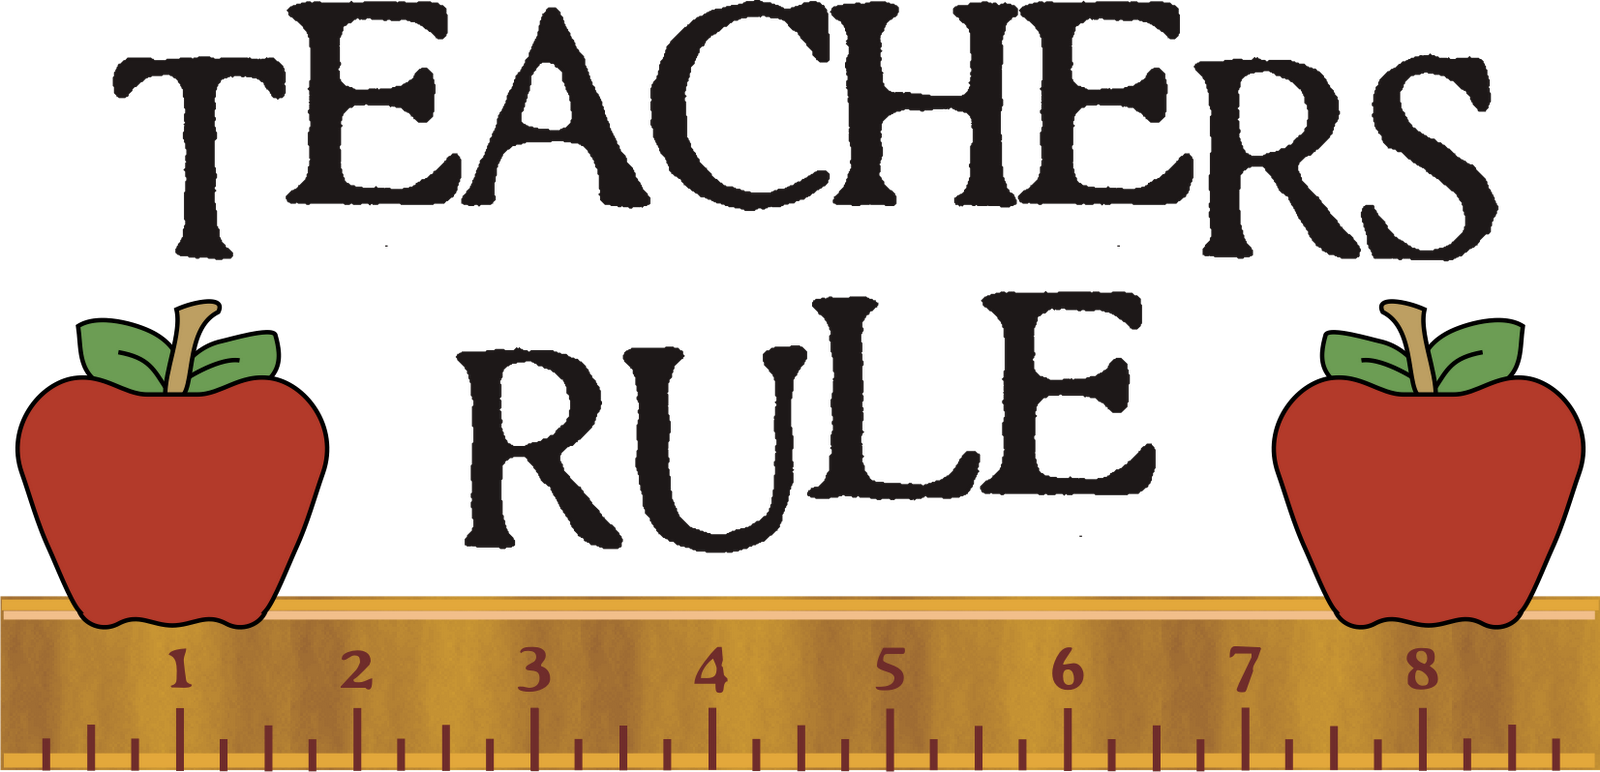 Teach clipart rule regulation. Teacher pages keystone elementary